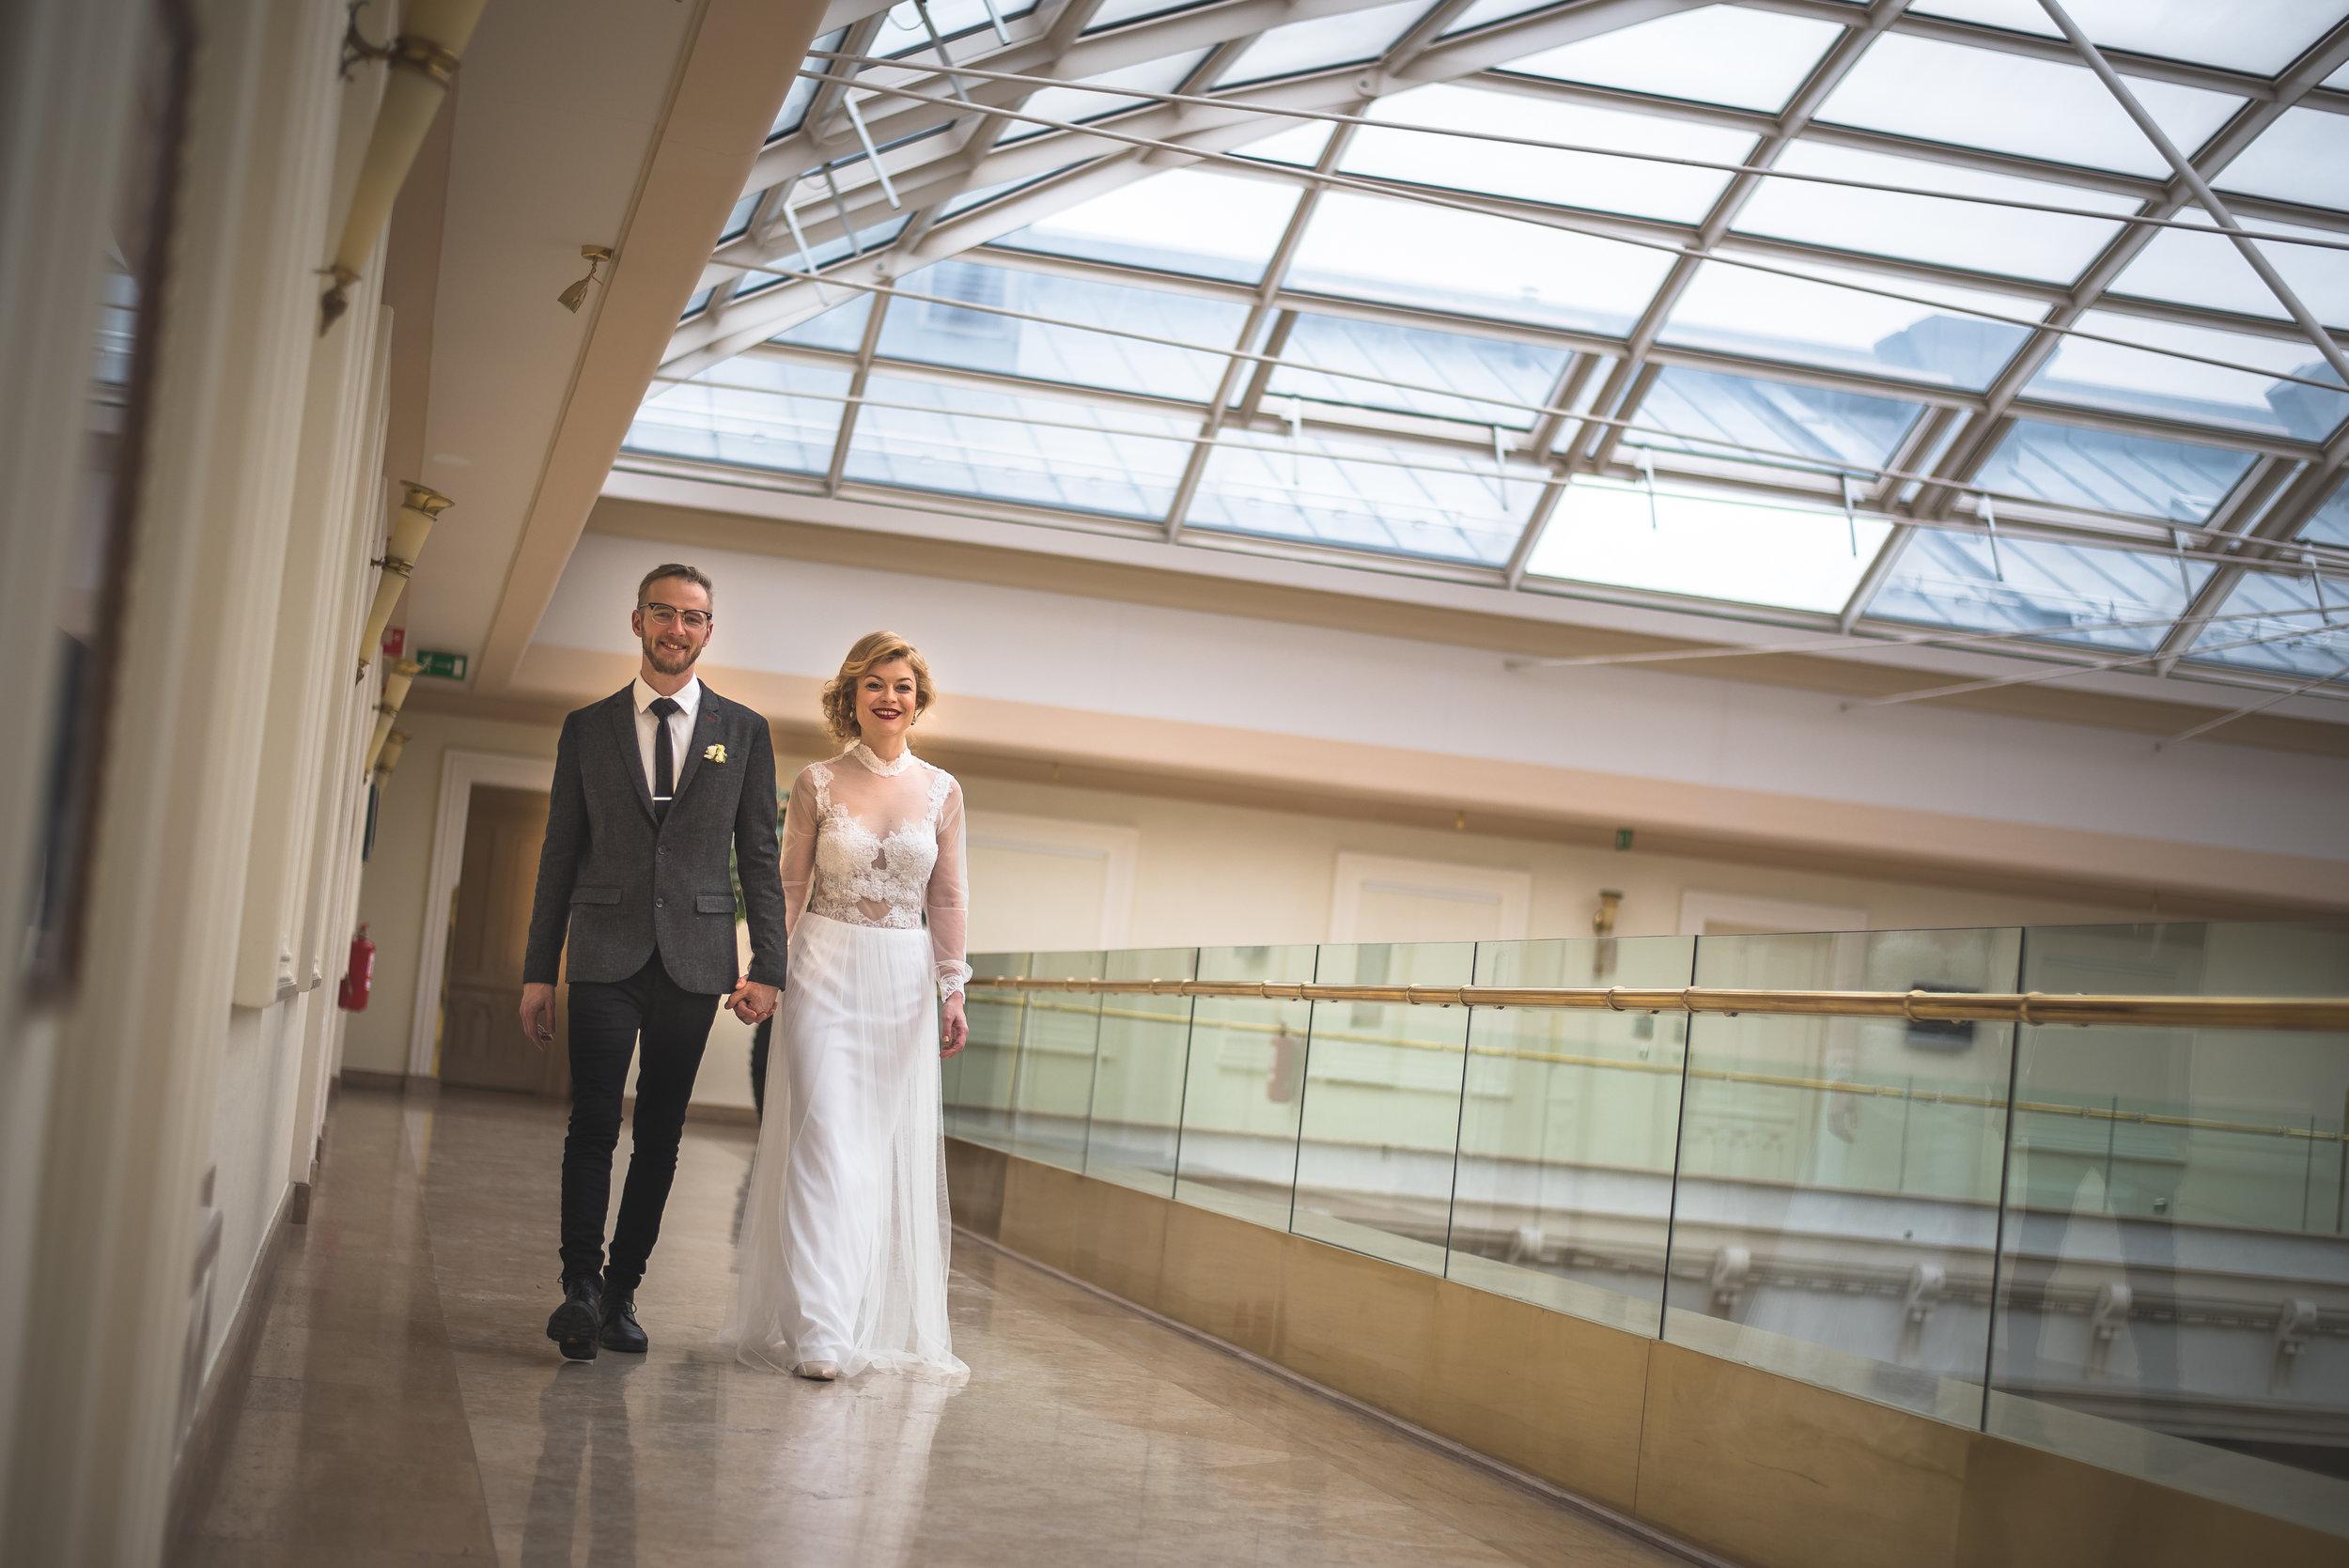 BrideGroomPhotos-8.jpg